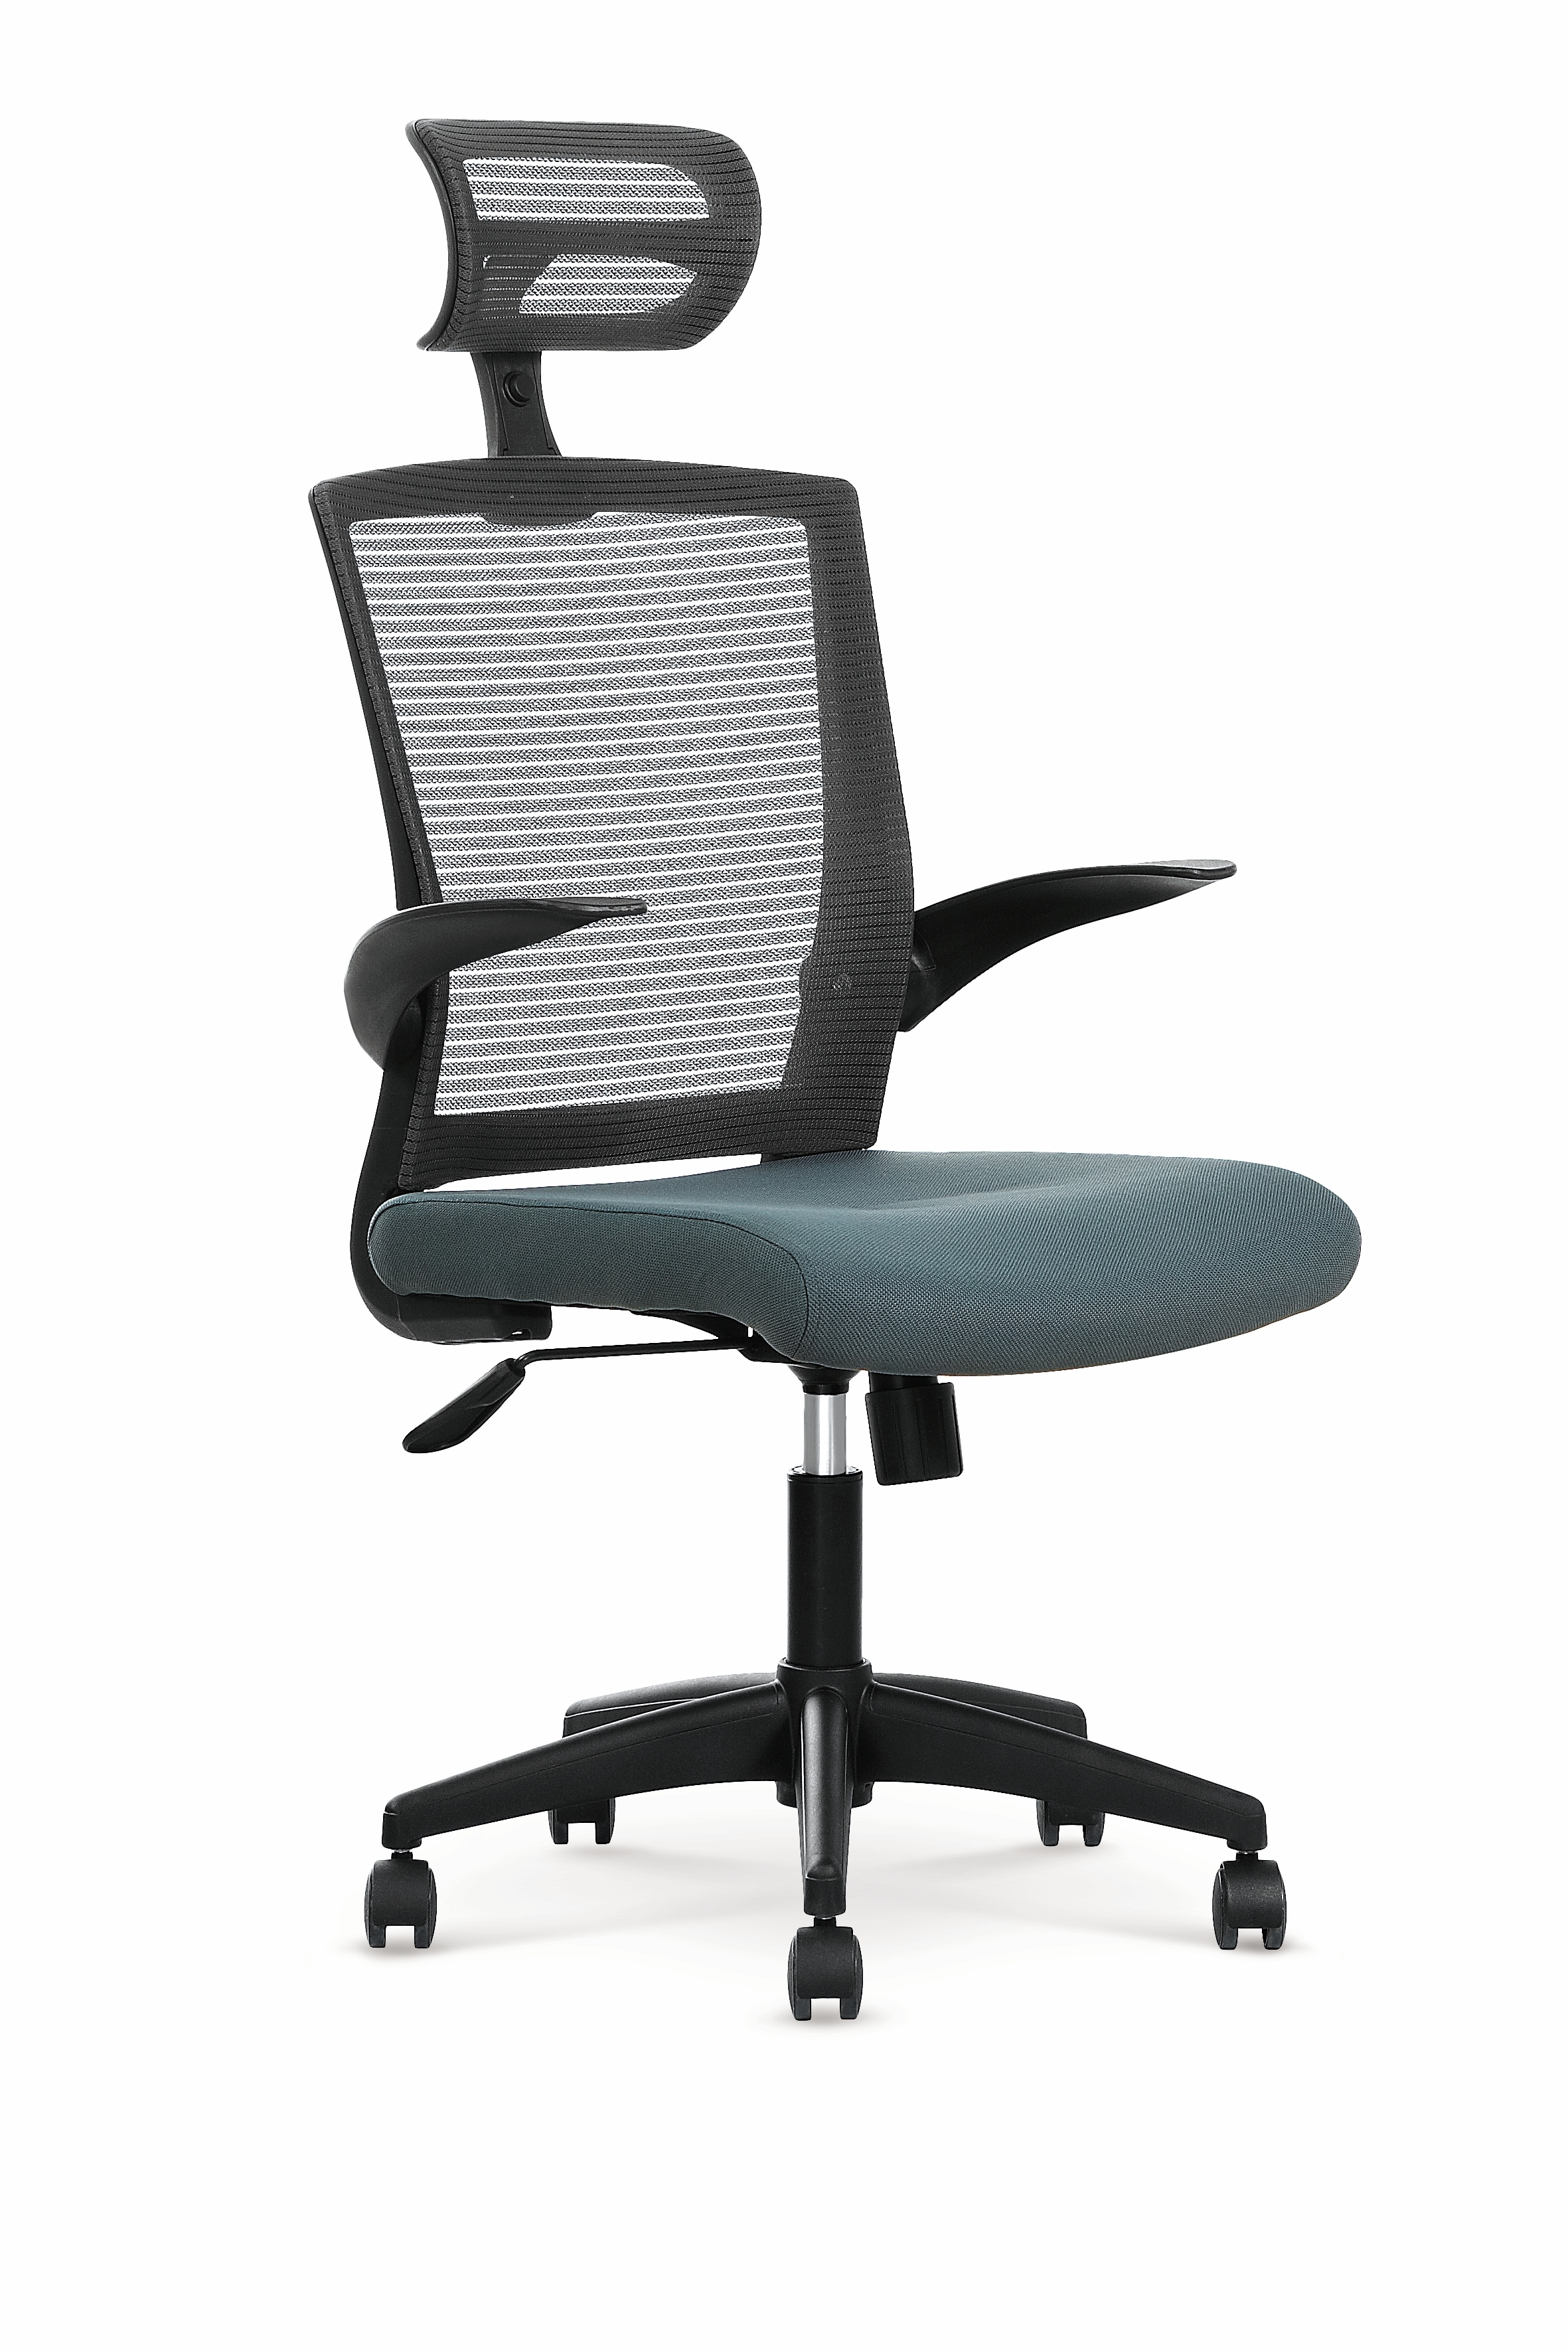 Scaun de birou ergonomic Valor Black / Grey, l64xA62xH115-125 cm